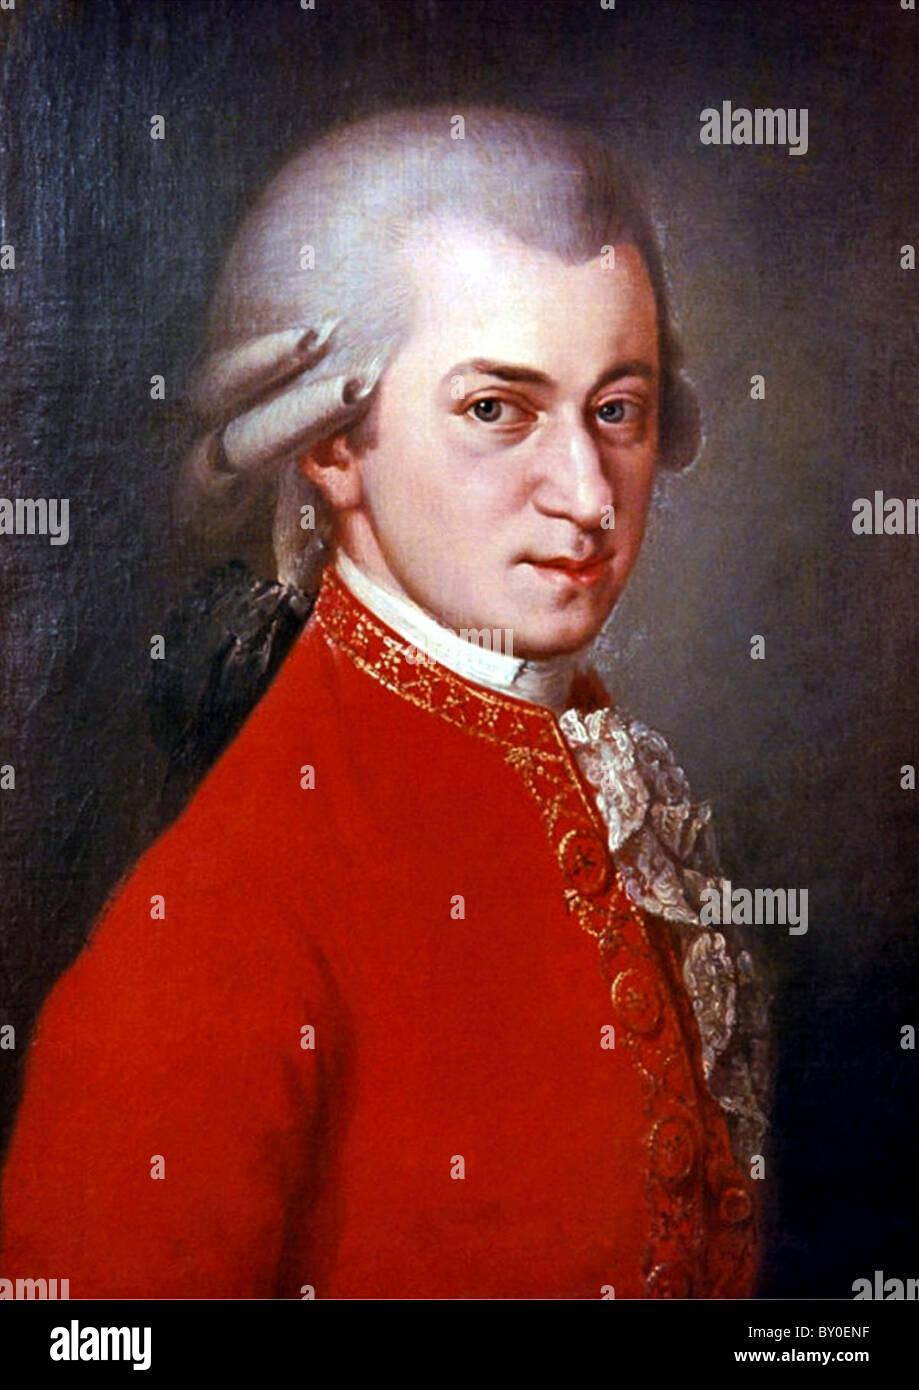 Mozart, compositor Wolfgang Amadeus Mozart Imagens de Stock